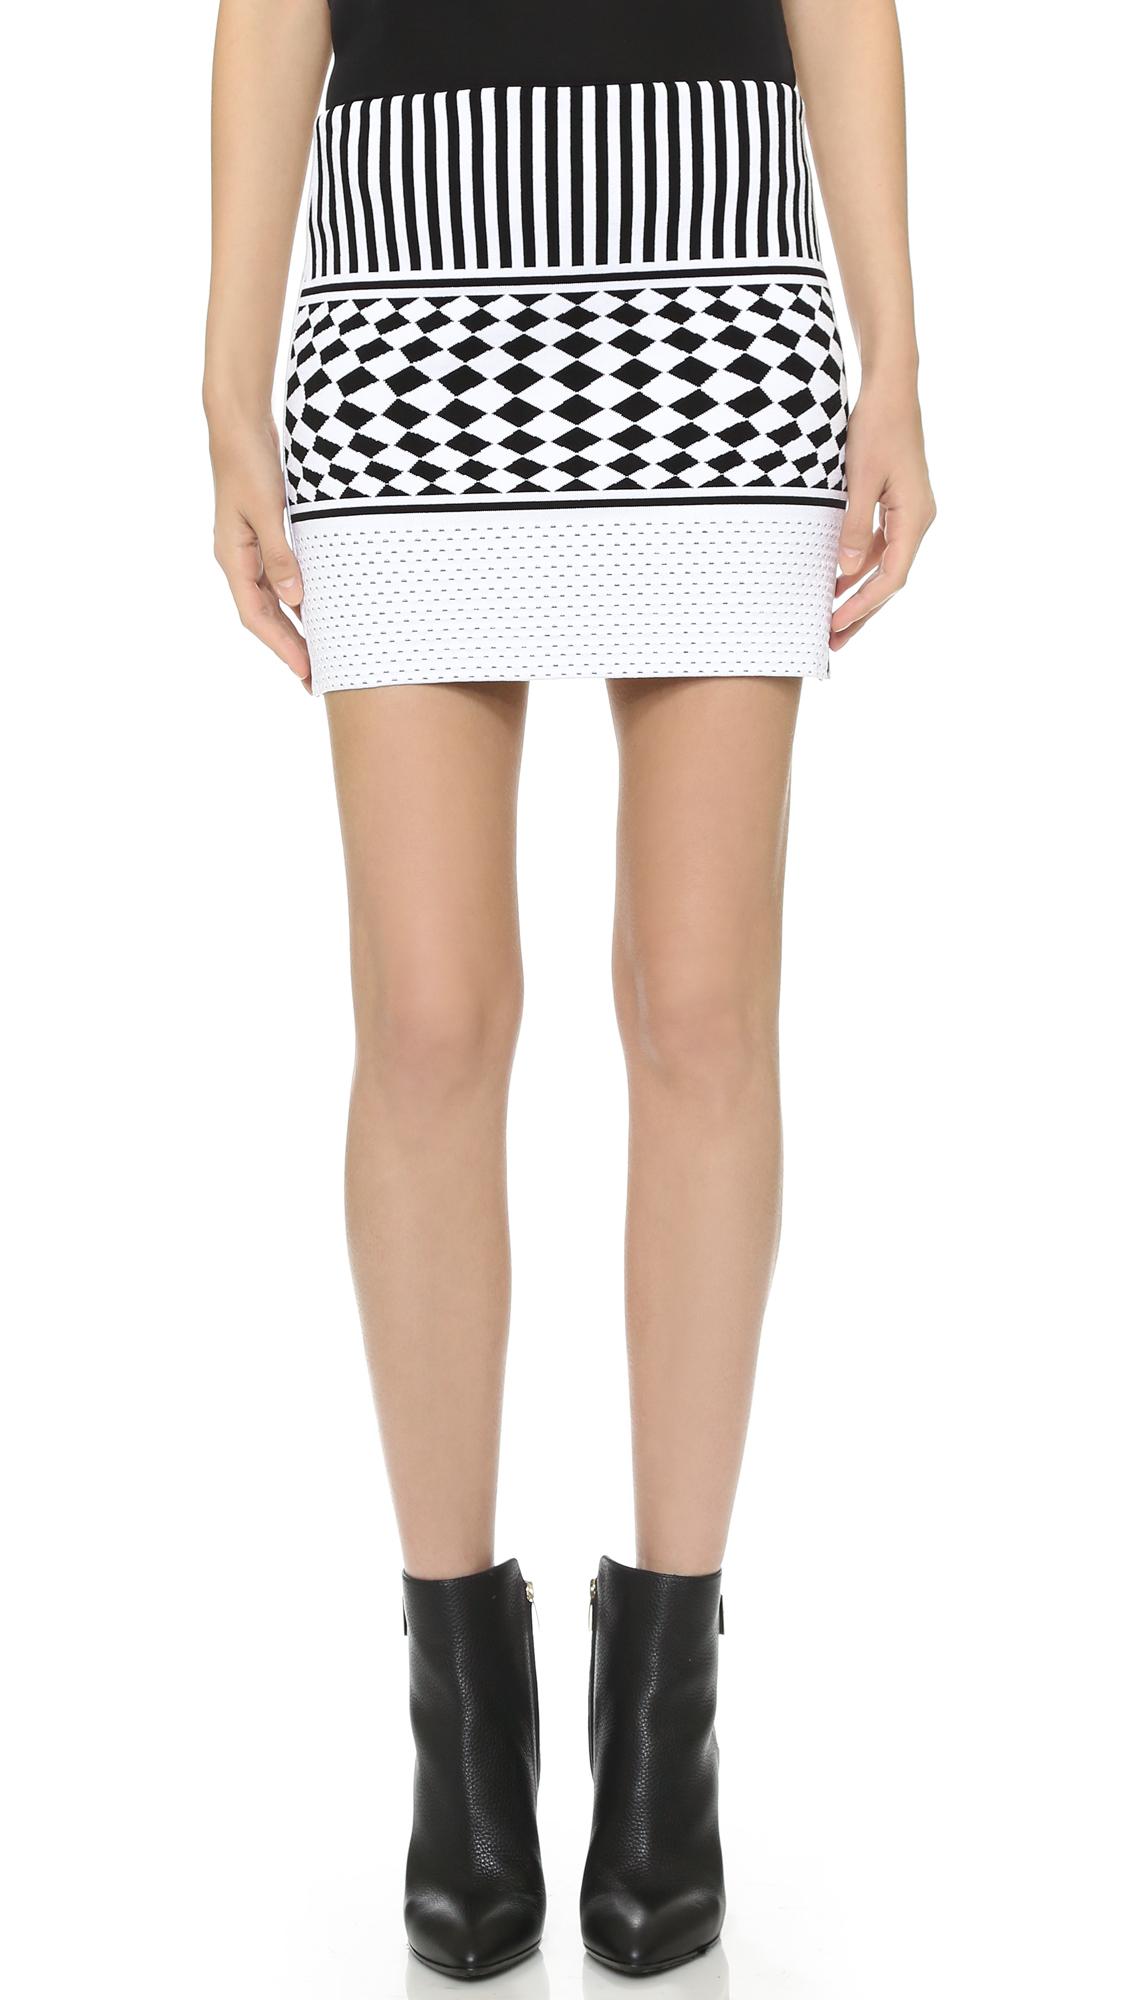 Antonio Berardi Knit Skirt - Black/White at Shopbop